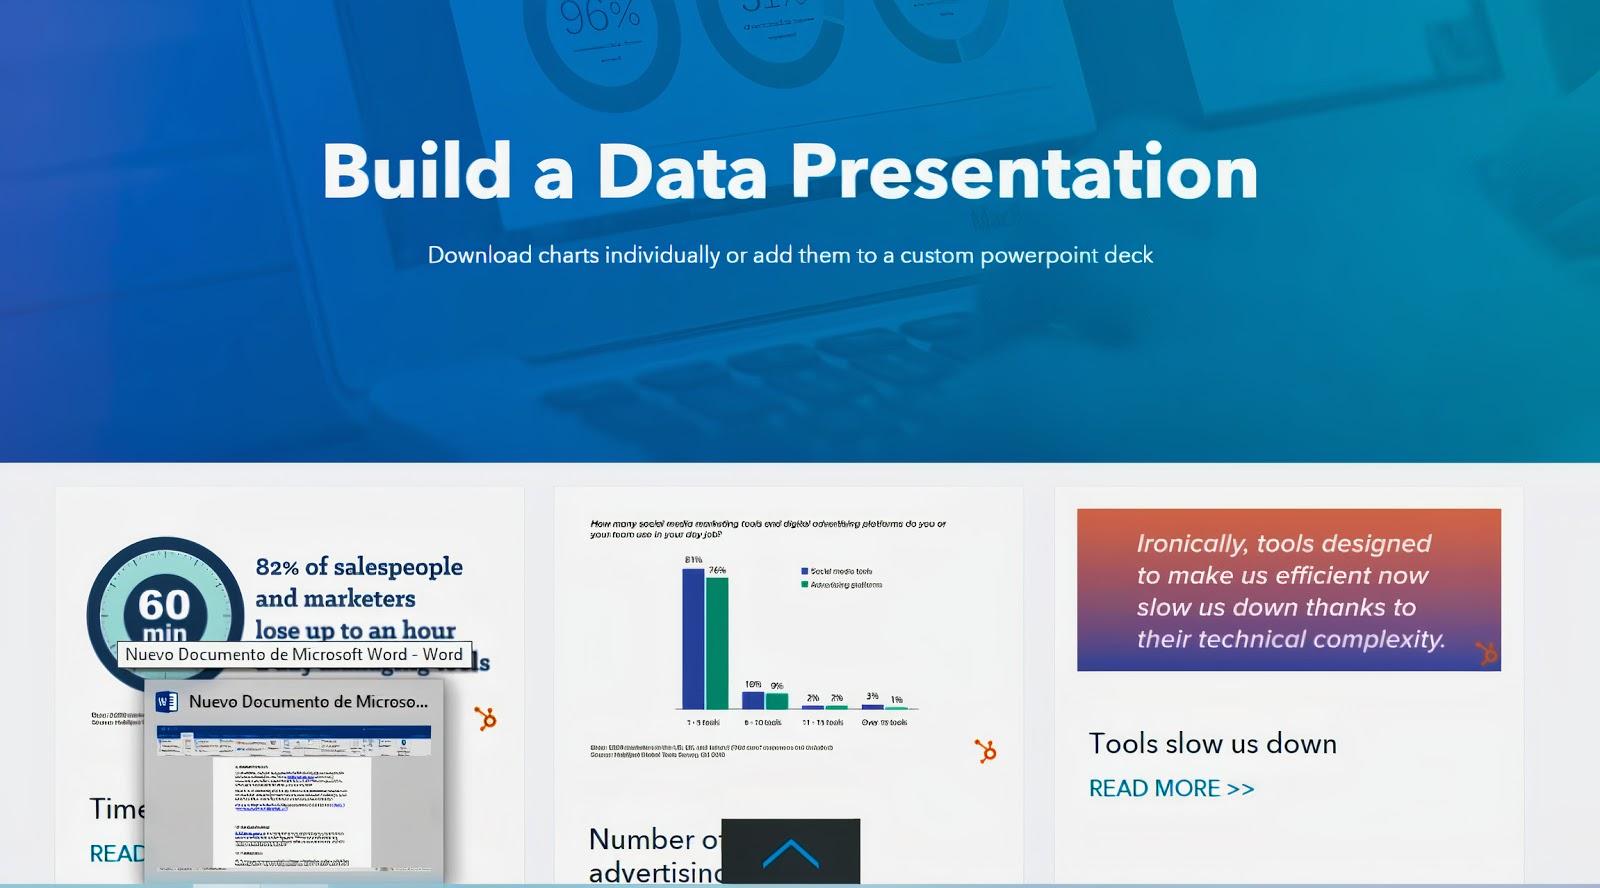 A screenshot of a HubSpot webpage about building a data presentation